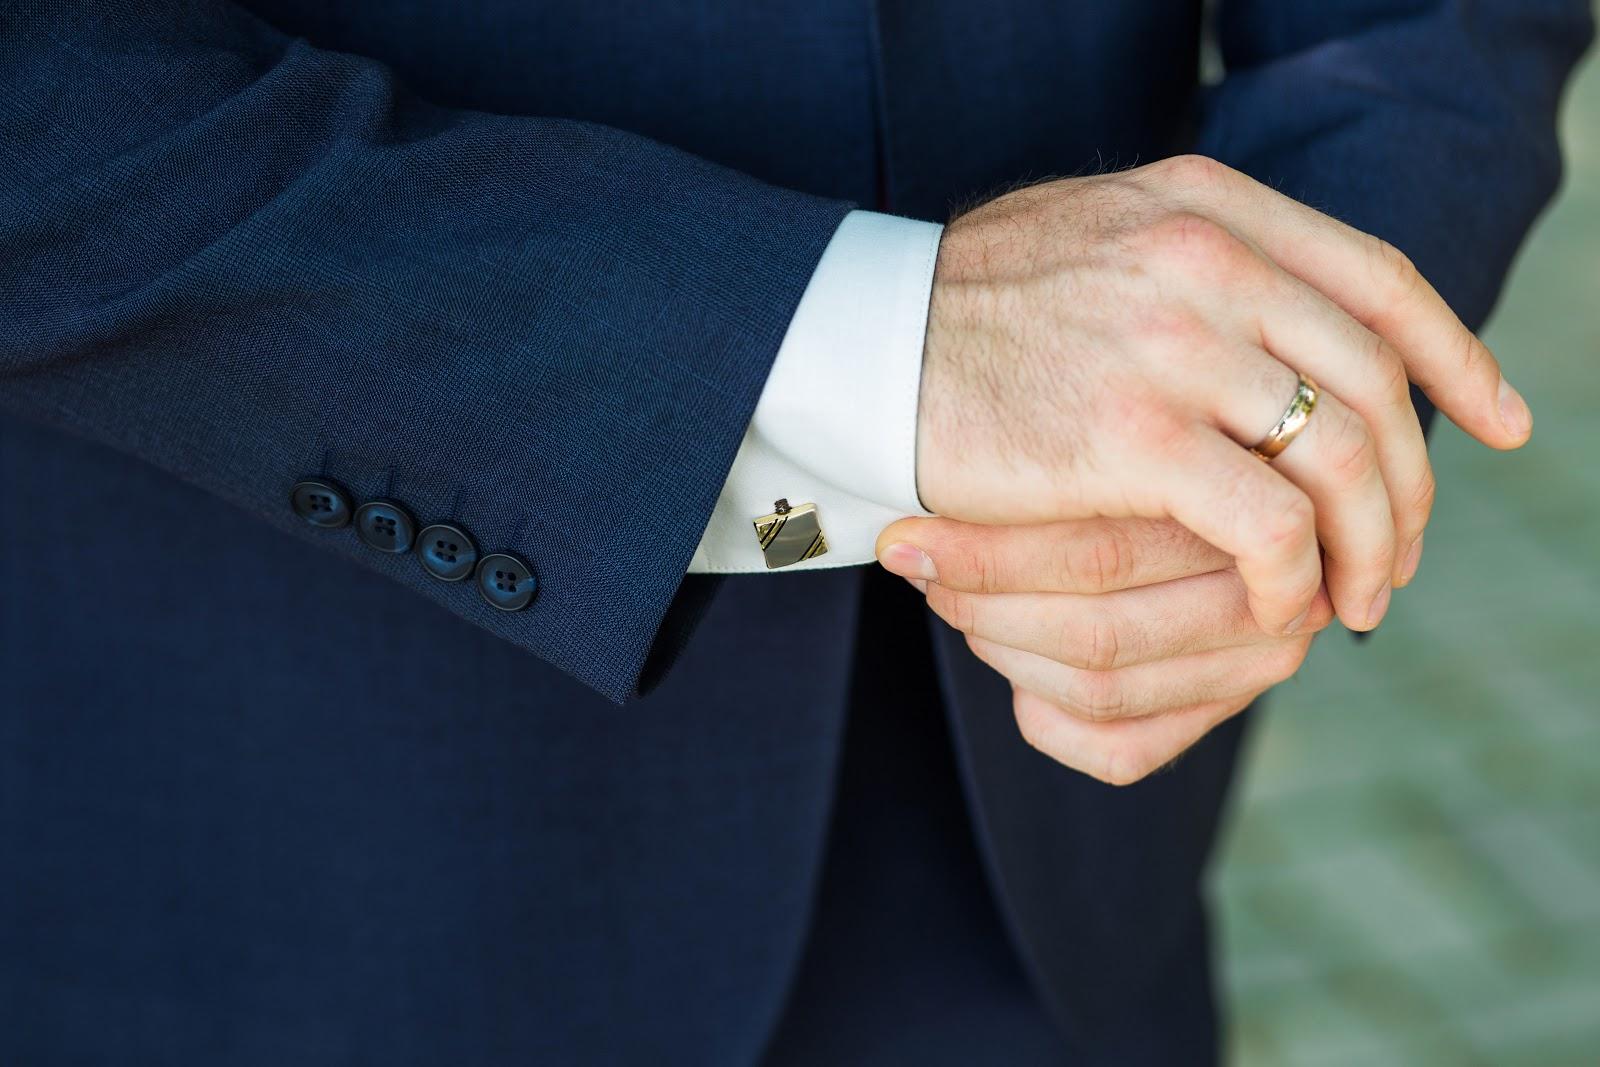 Singapore Tailor Guide_men showing cufflink